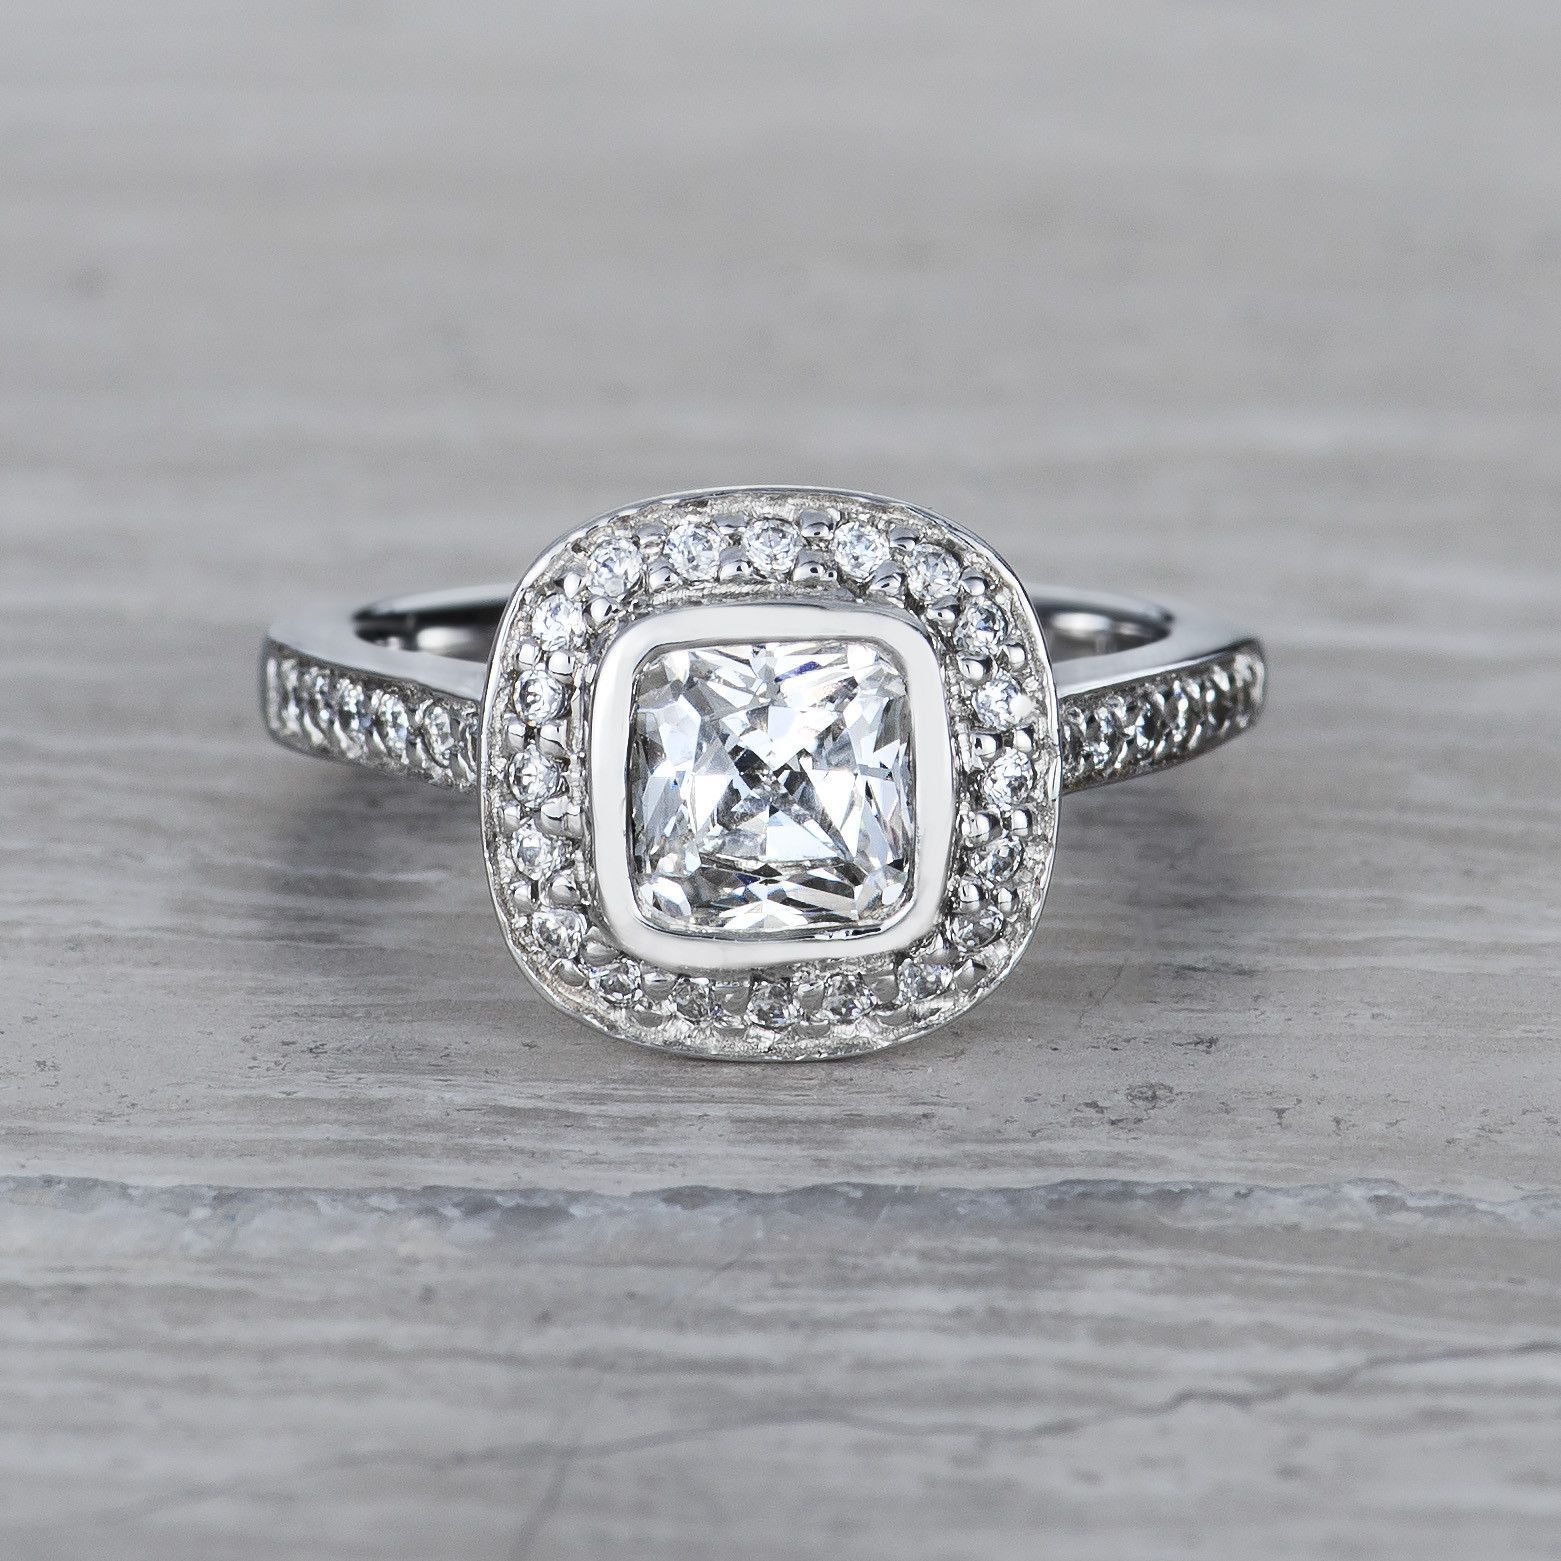 Ct princess cut diamond halo engagement ring solitaire